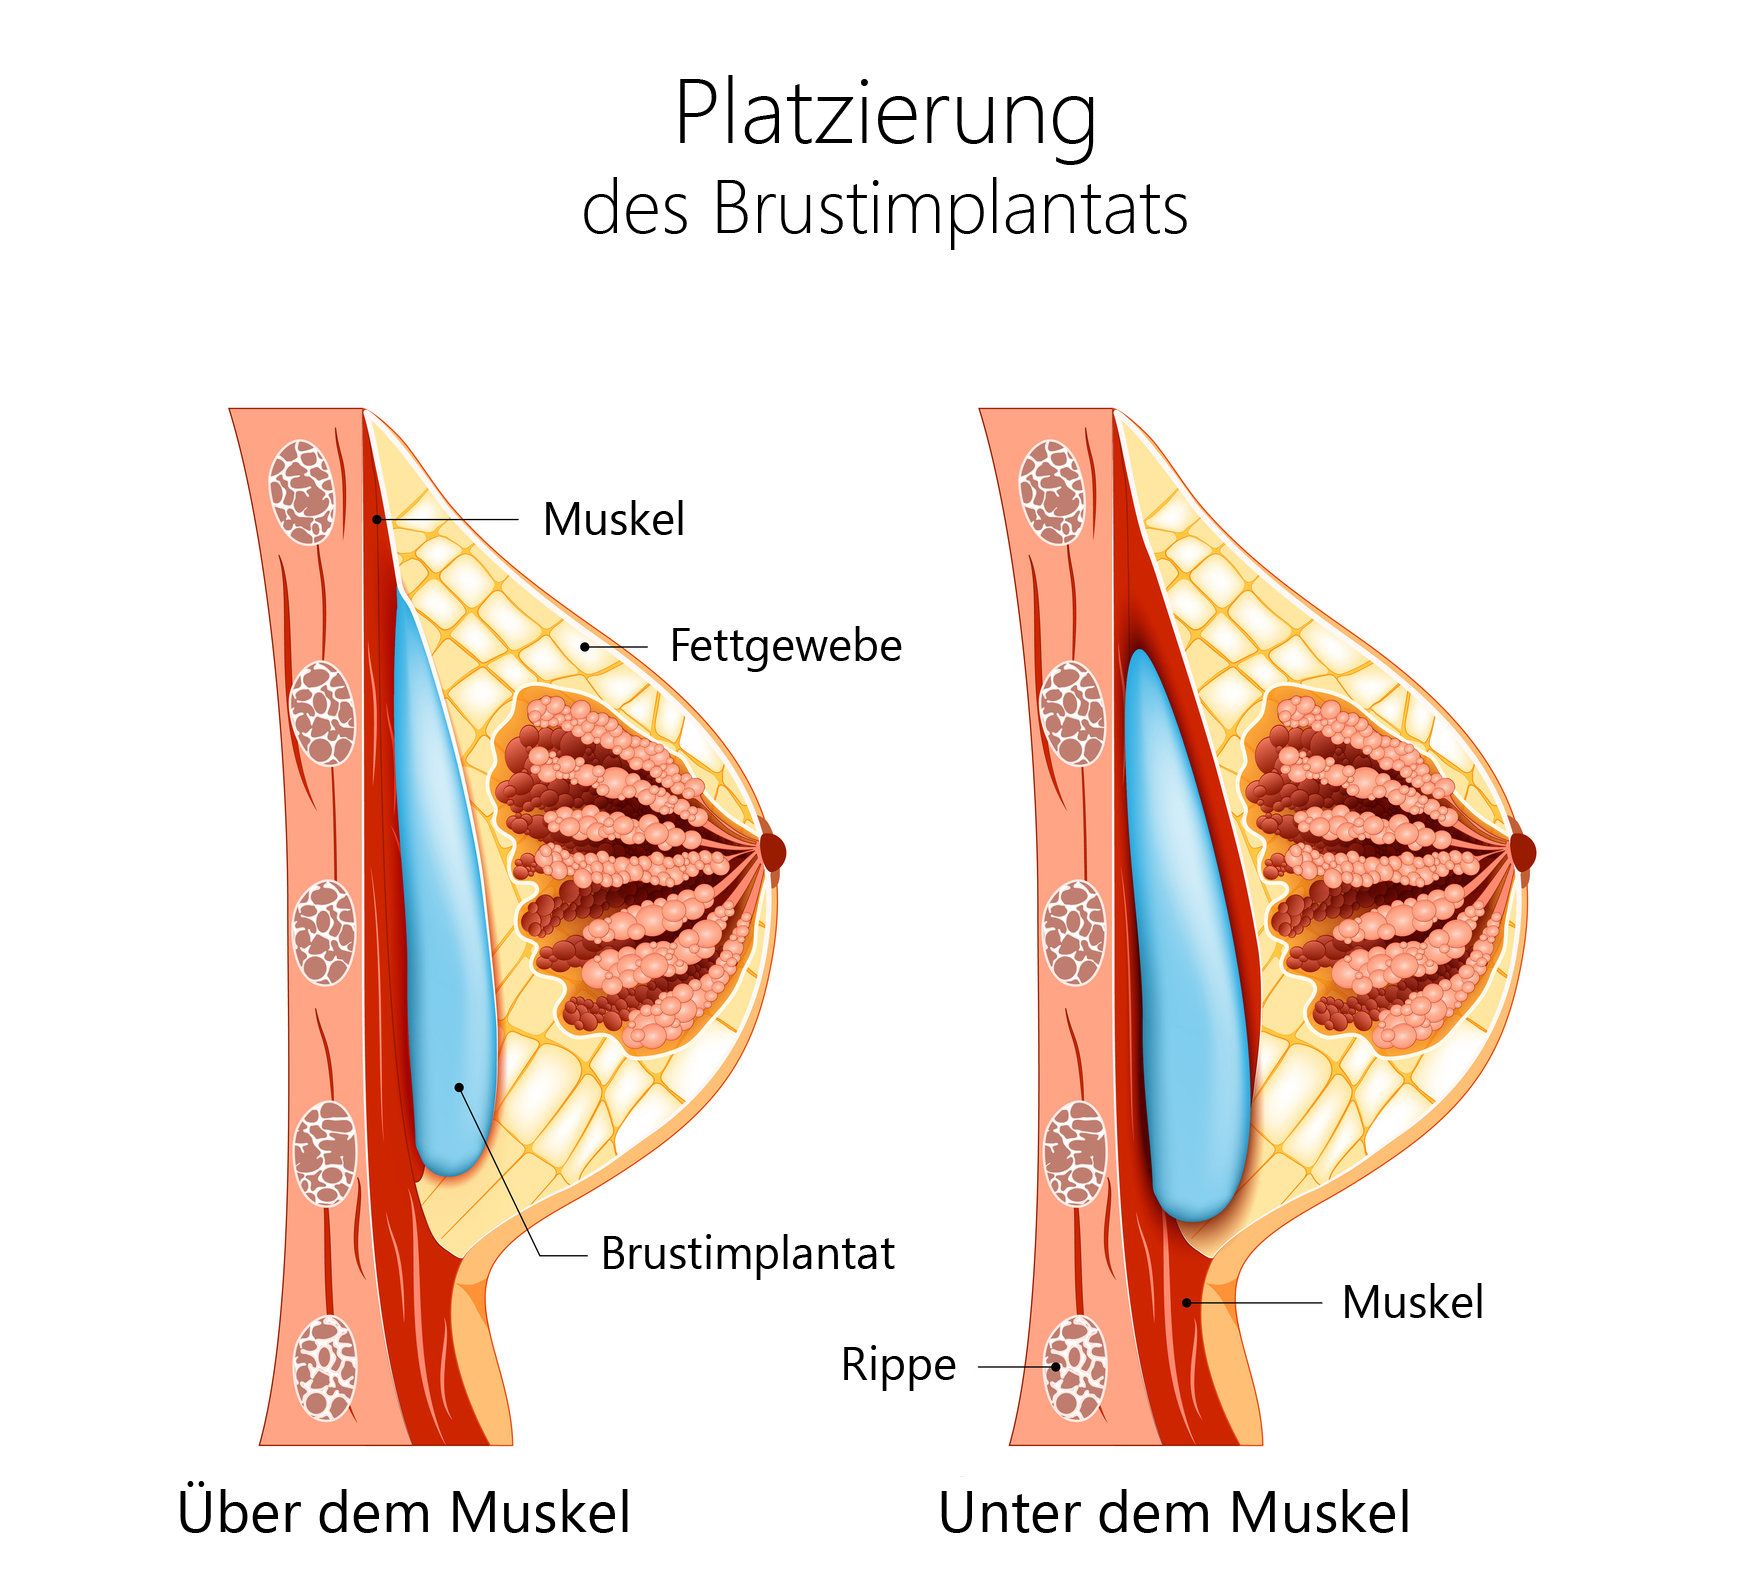 Brustimplantat, Brustvergroesserung, Silikonimplantat, Unterbrustmuskel, Ueberbrustmuskel